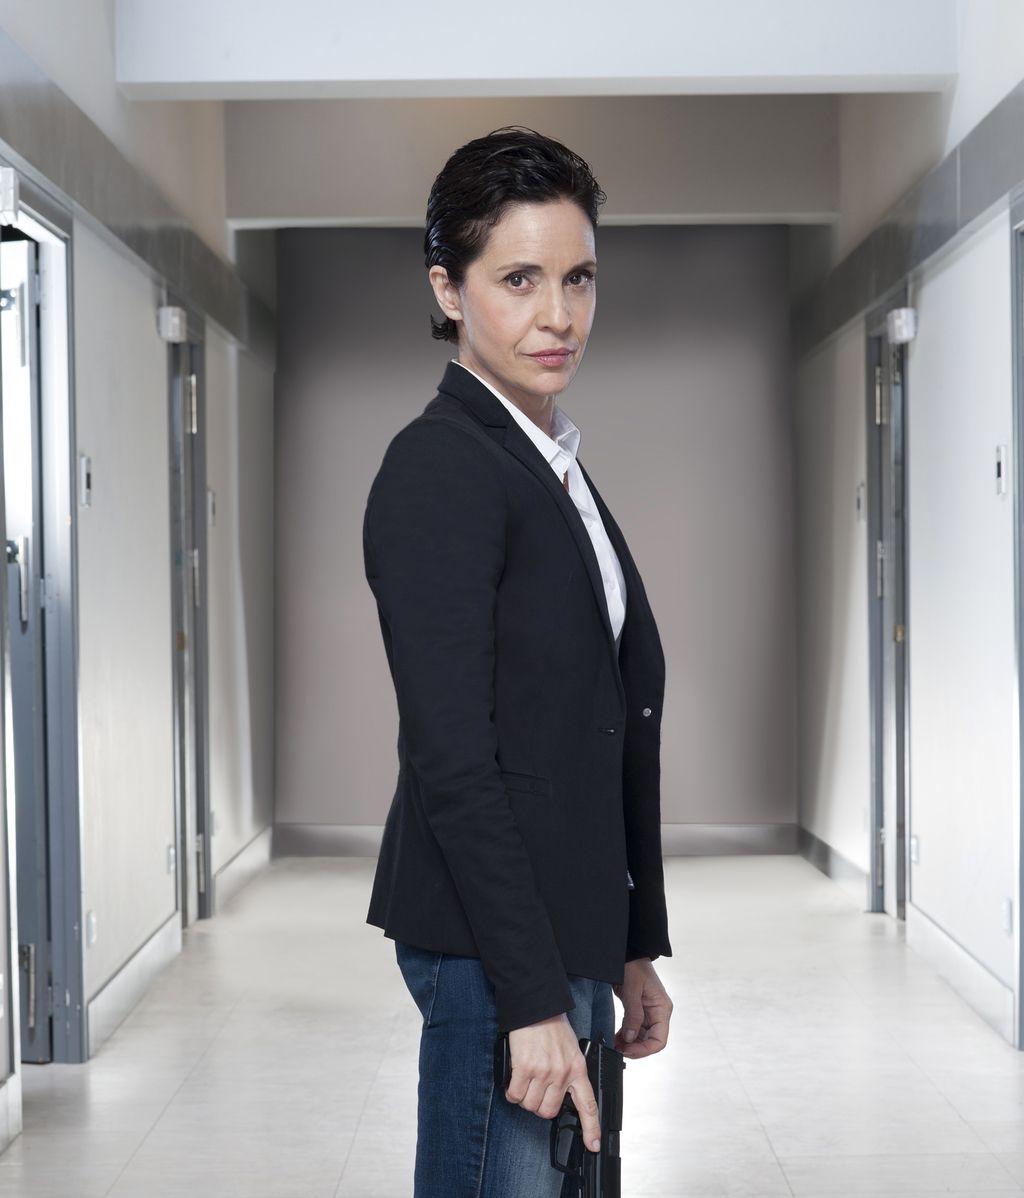 Adriana Ozores es Rubio